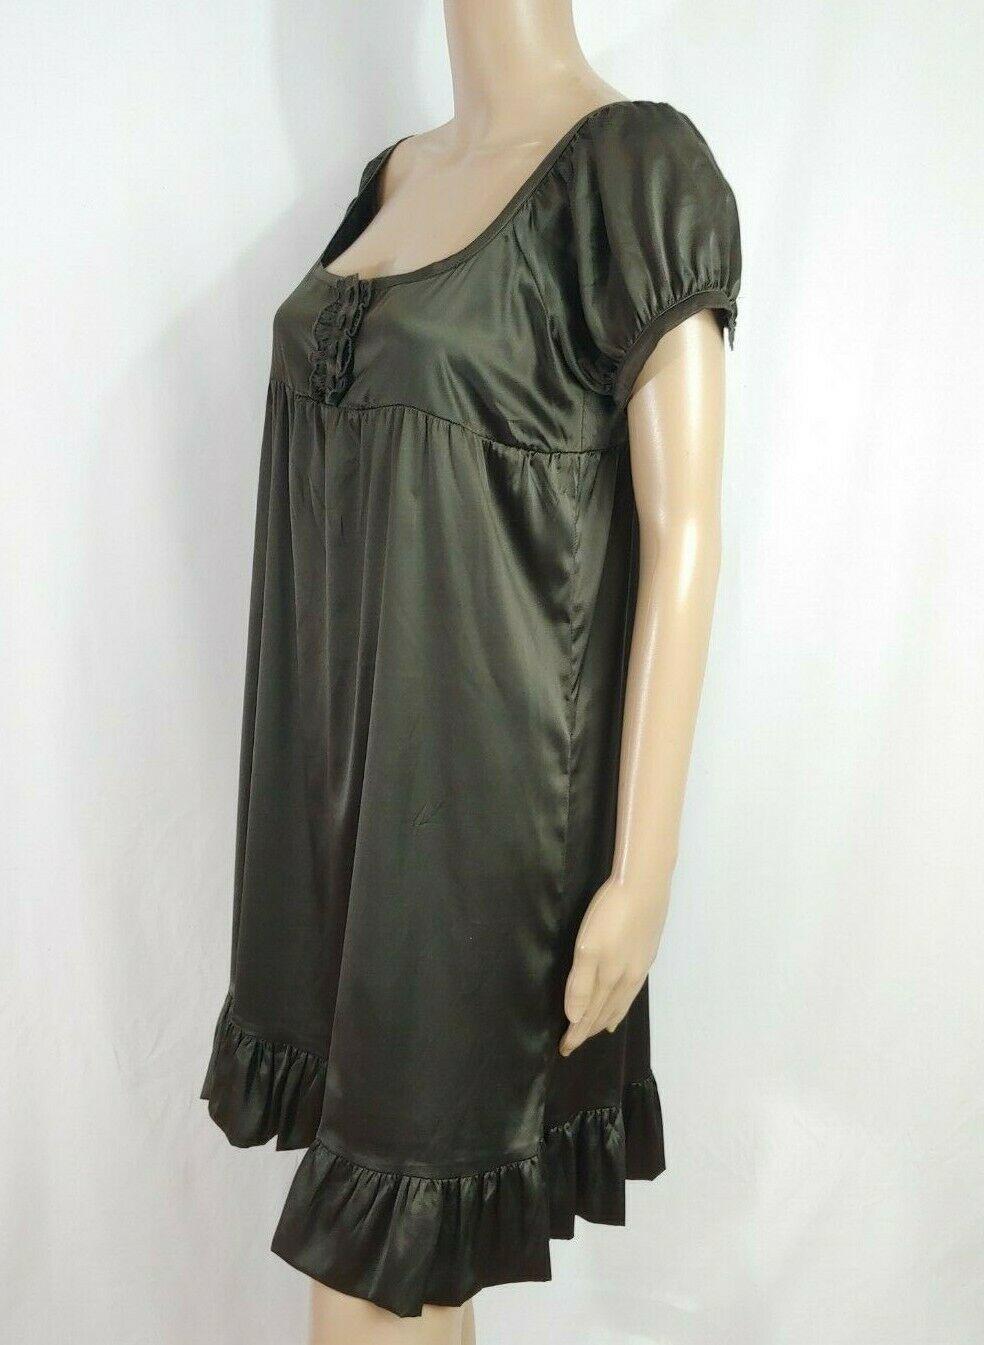 Bershka Zara Empire Babydoll Shirt Dress M Dark Brown Satin Ruffle Dolly Boho